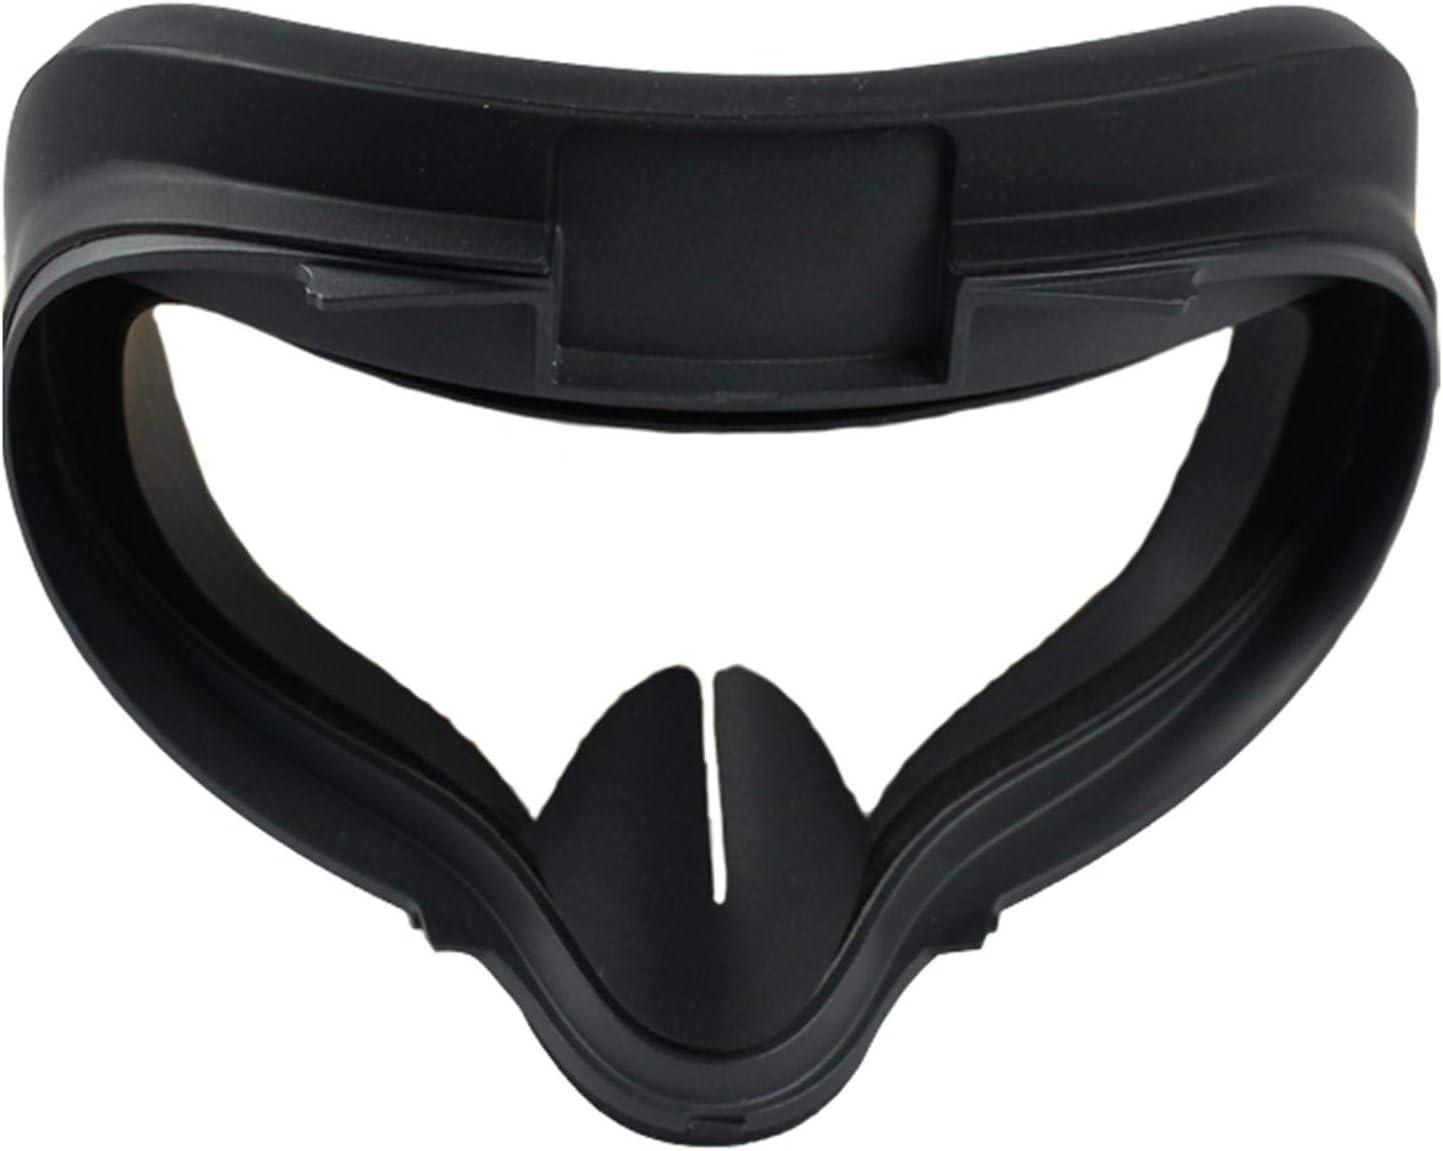 CALIDAKA VR Silicone Cove-r for Oculu-s Quest 2, Washable VR Eye Pad Protecting Cove-r Cushion for Oculu-s Quest 2,Sweatproof Anti Sweat